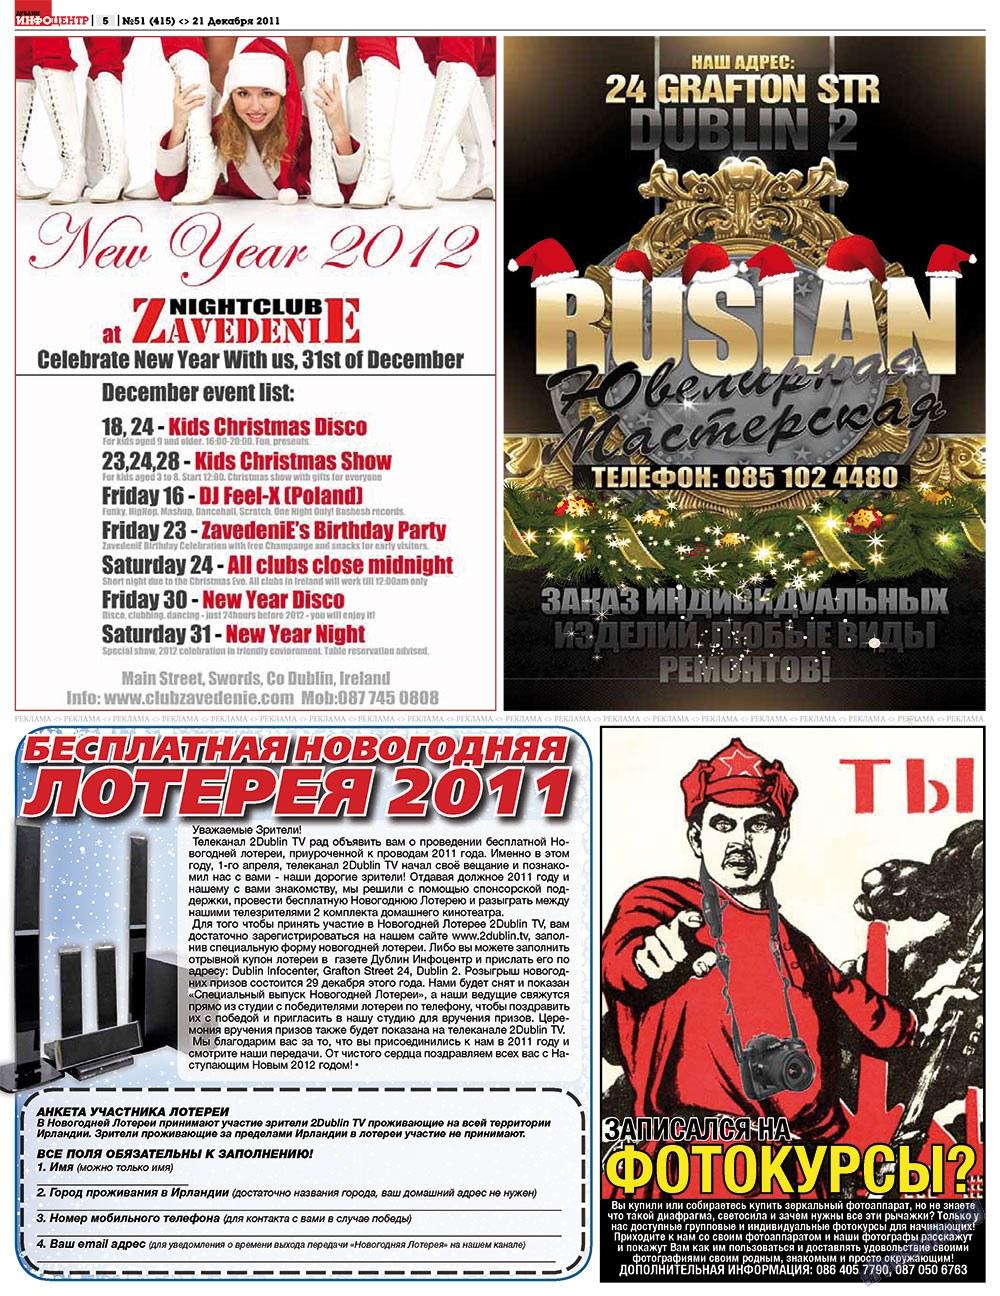 Дублин инфоцентр (газета). 2011 год, номер 51, стр. 5